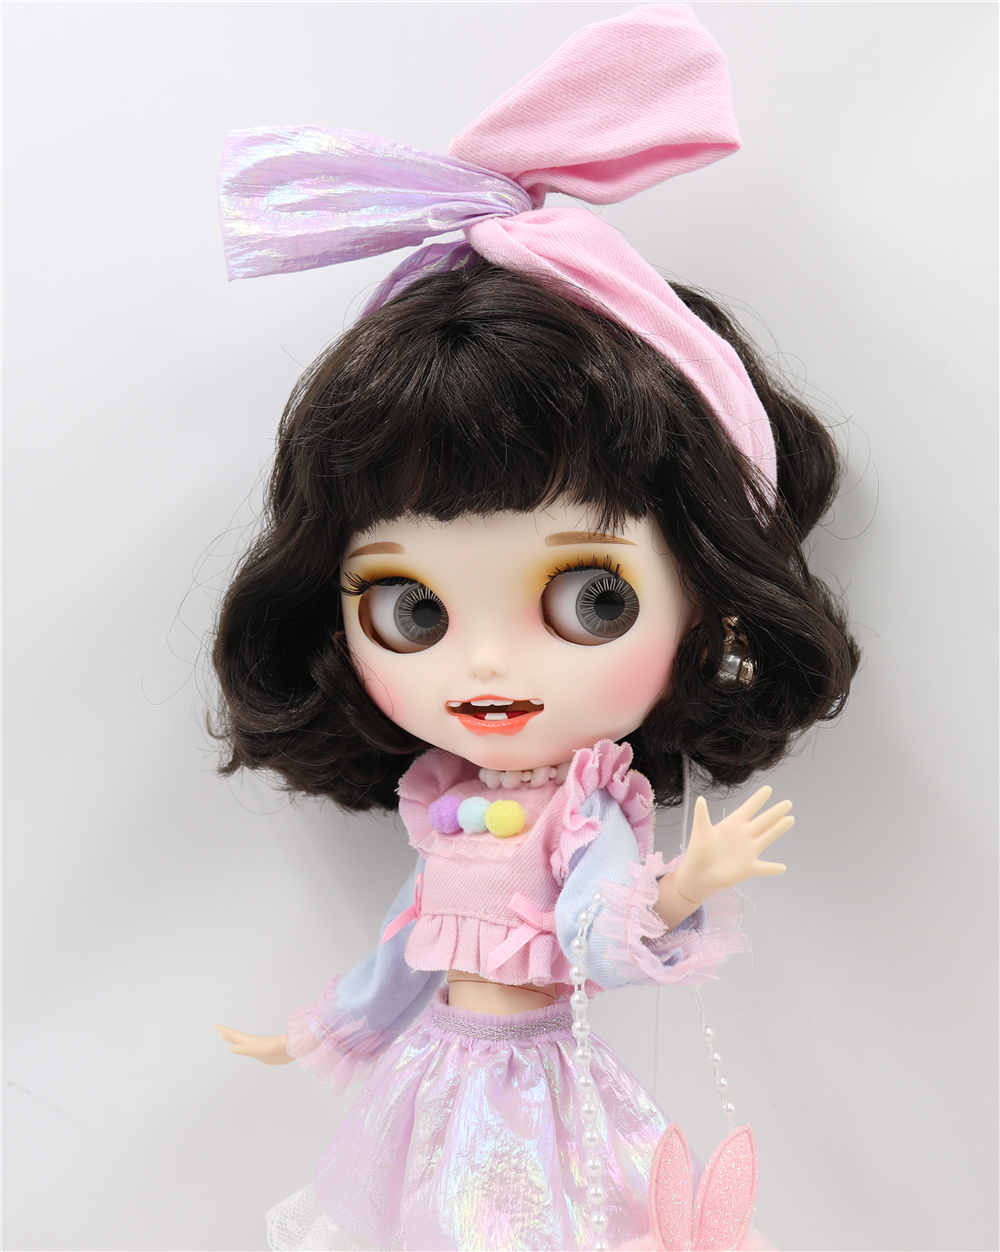 Jovita – Premium Custom Blythe Doll with Smiling Face 1